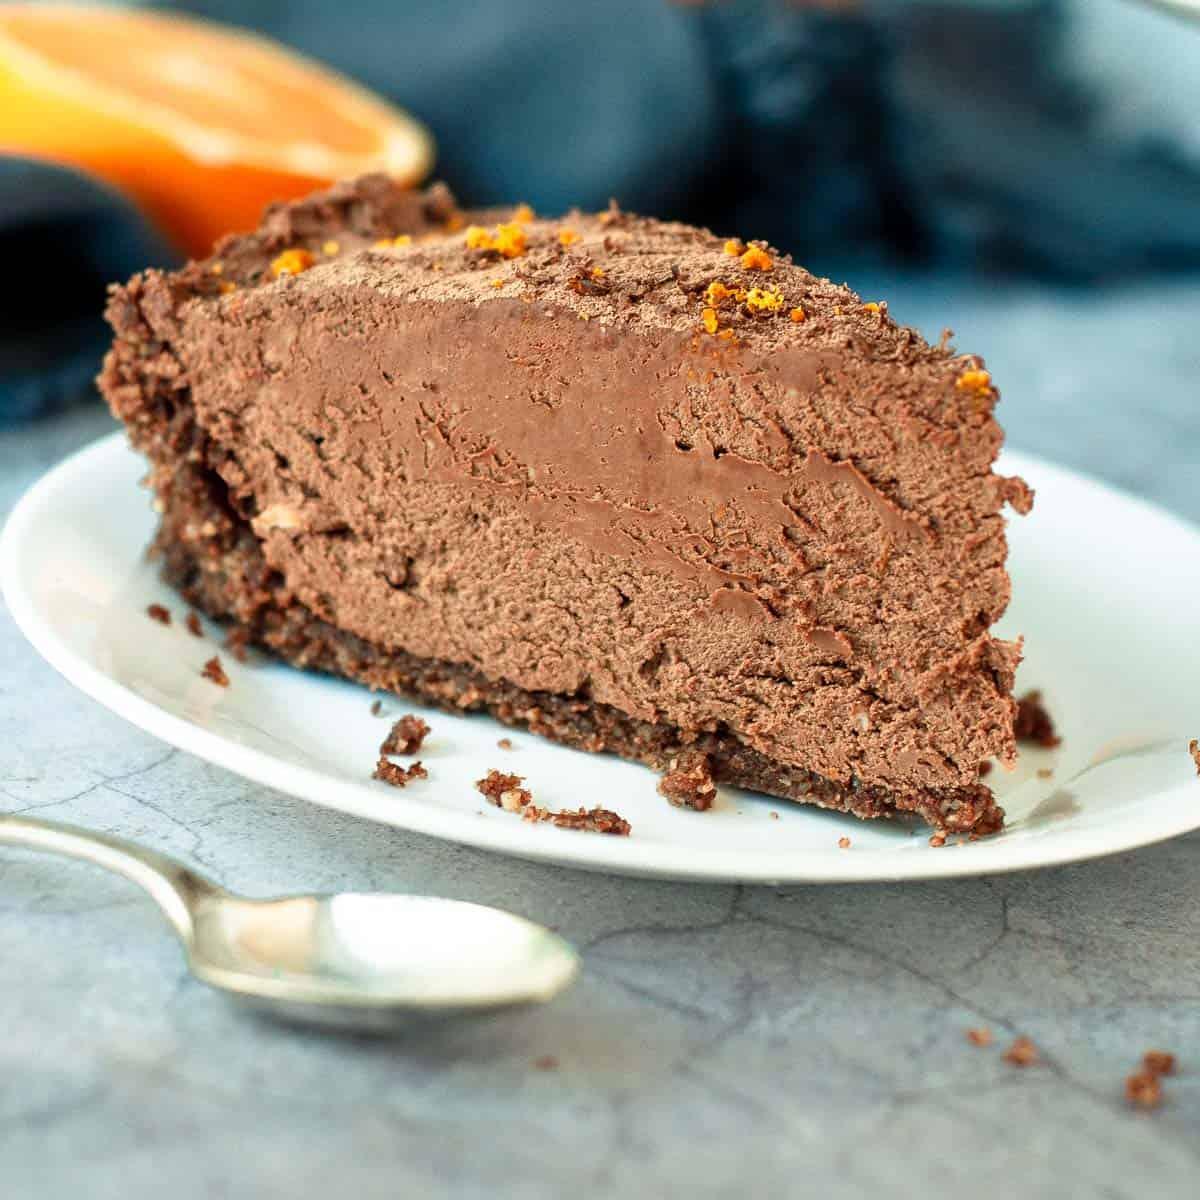 a single slice of chocolate orange cheesecake on a plate